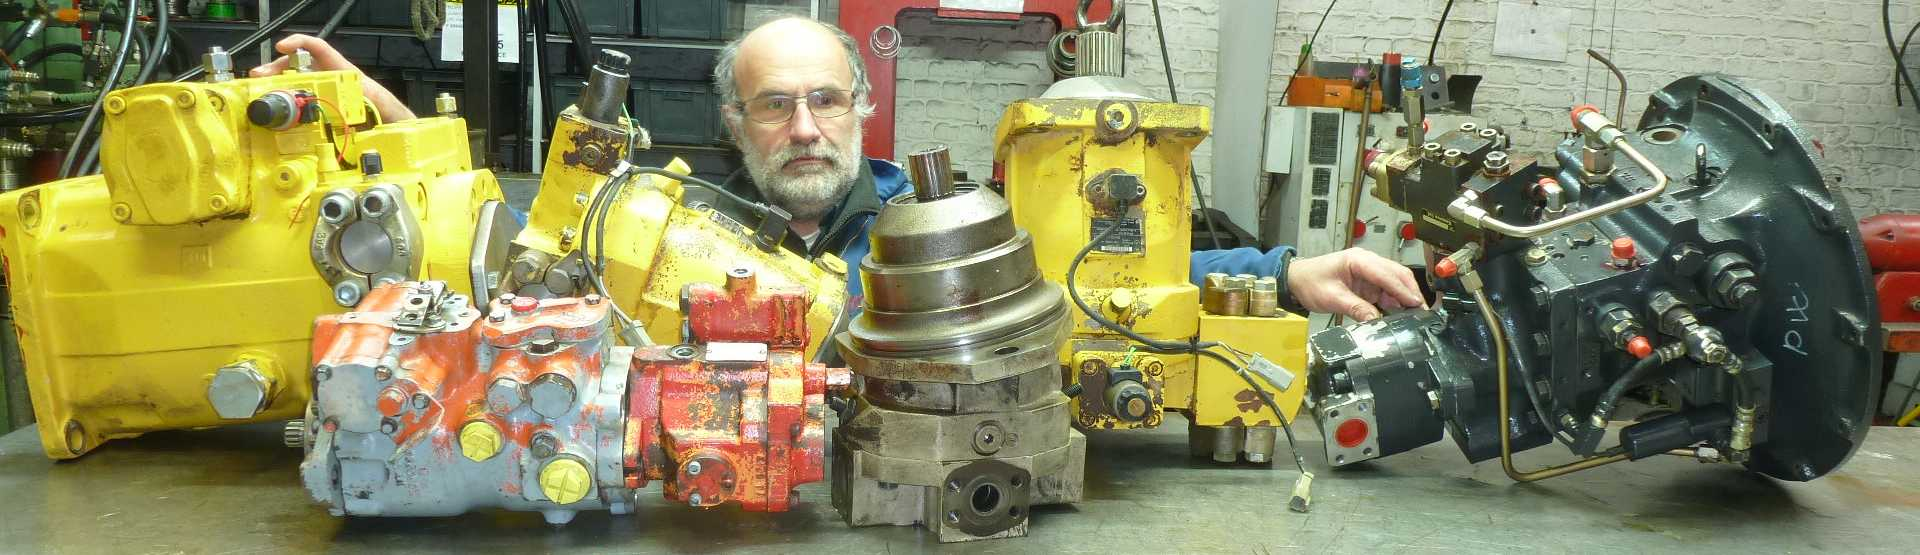 reparations pompes hydraulique